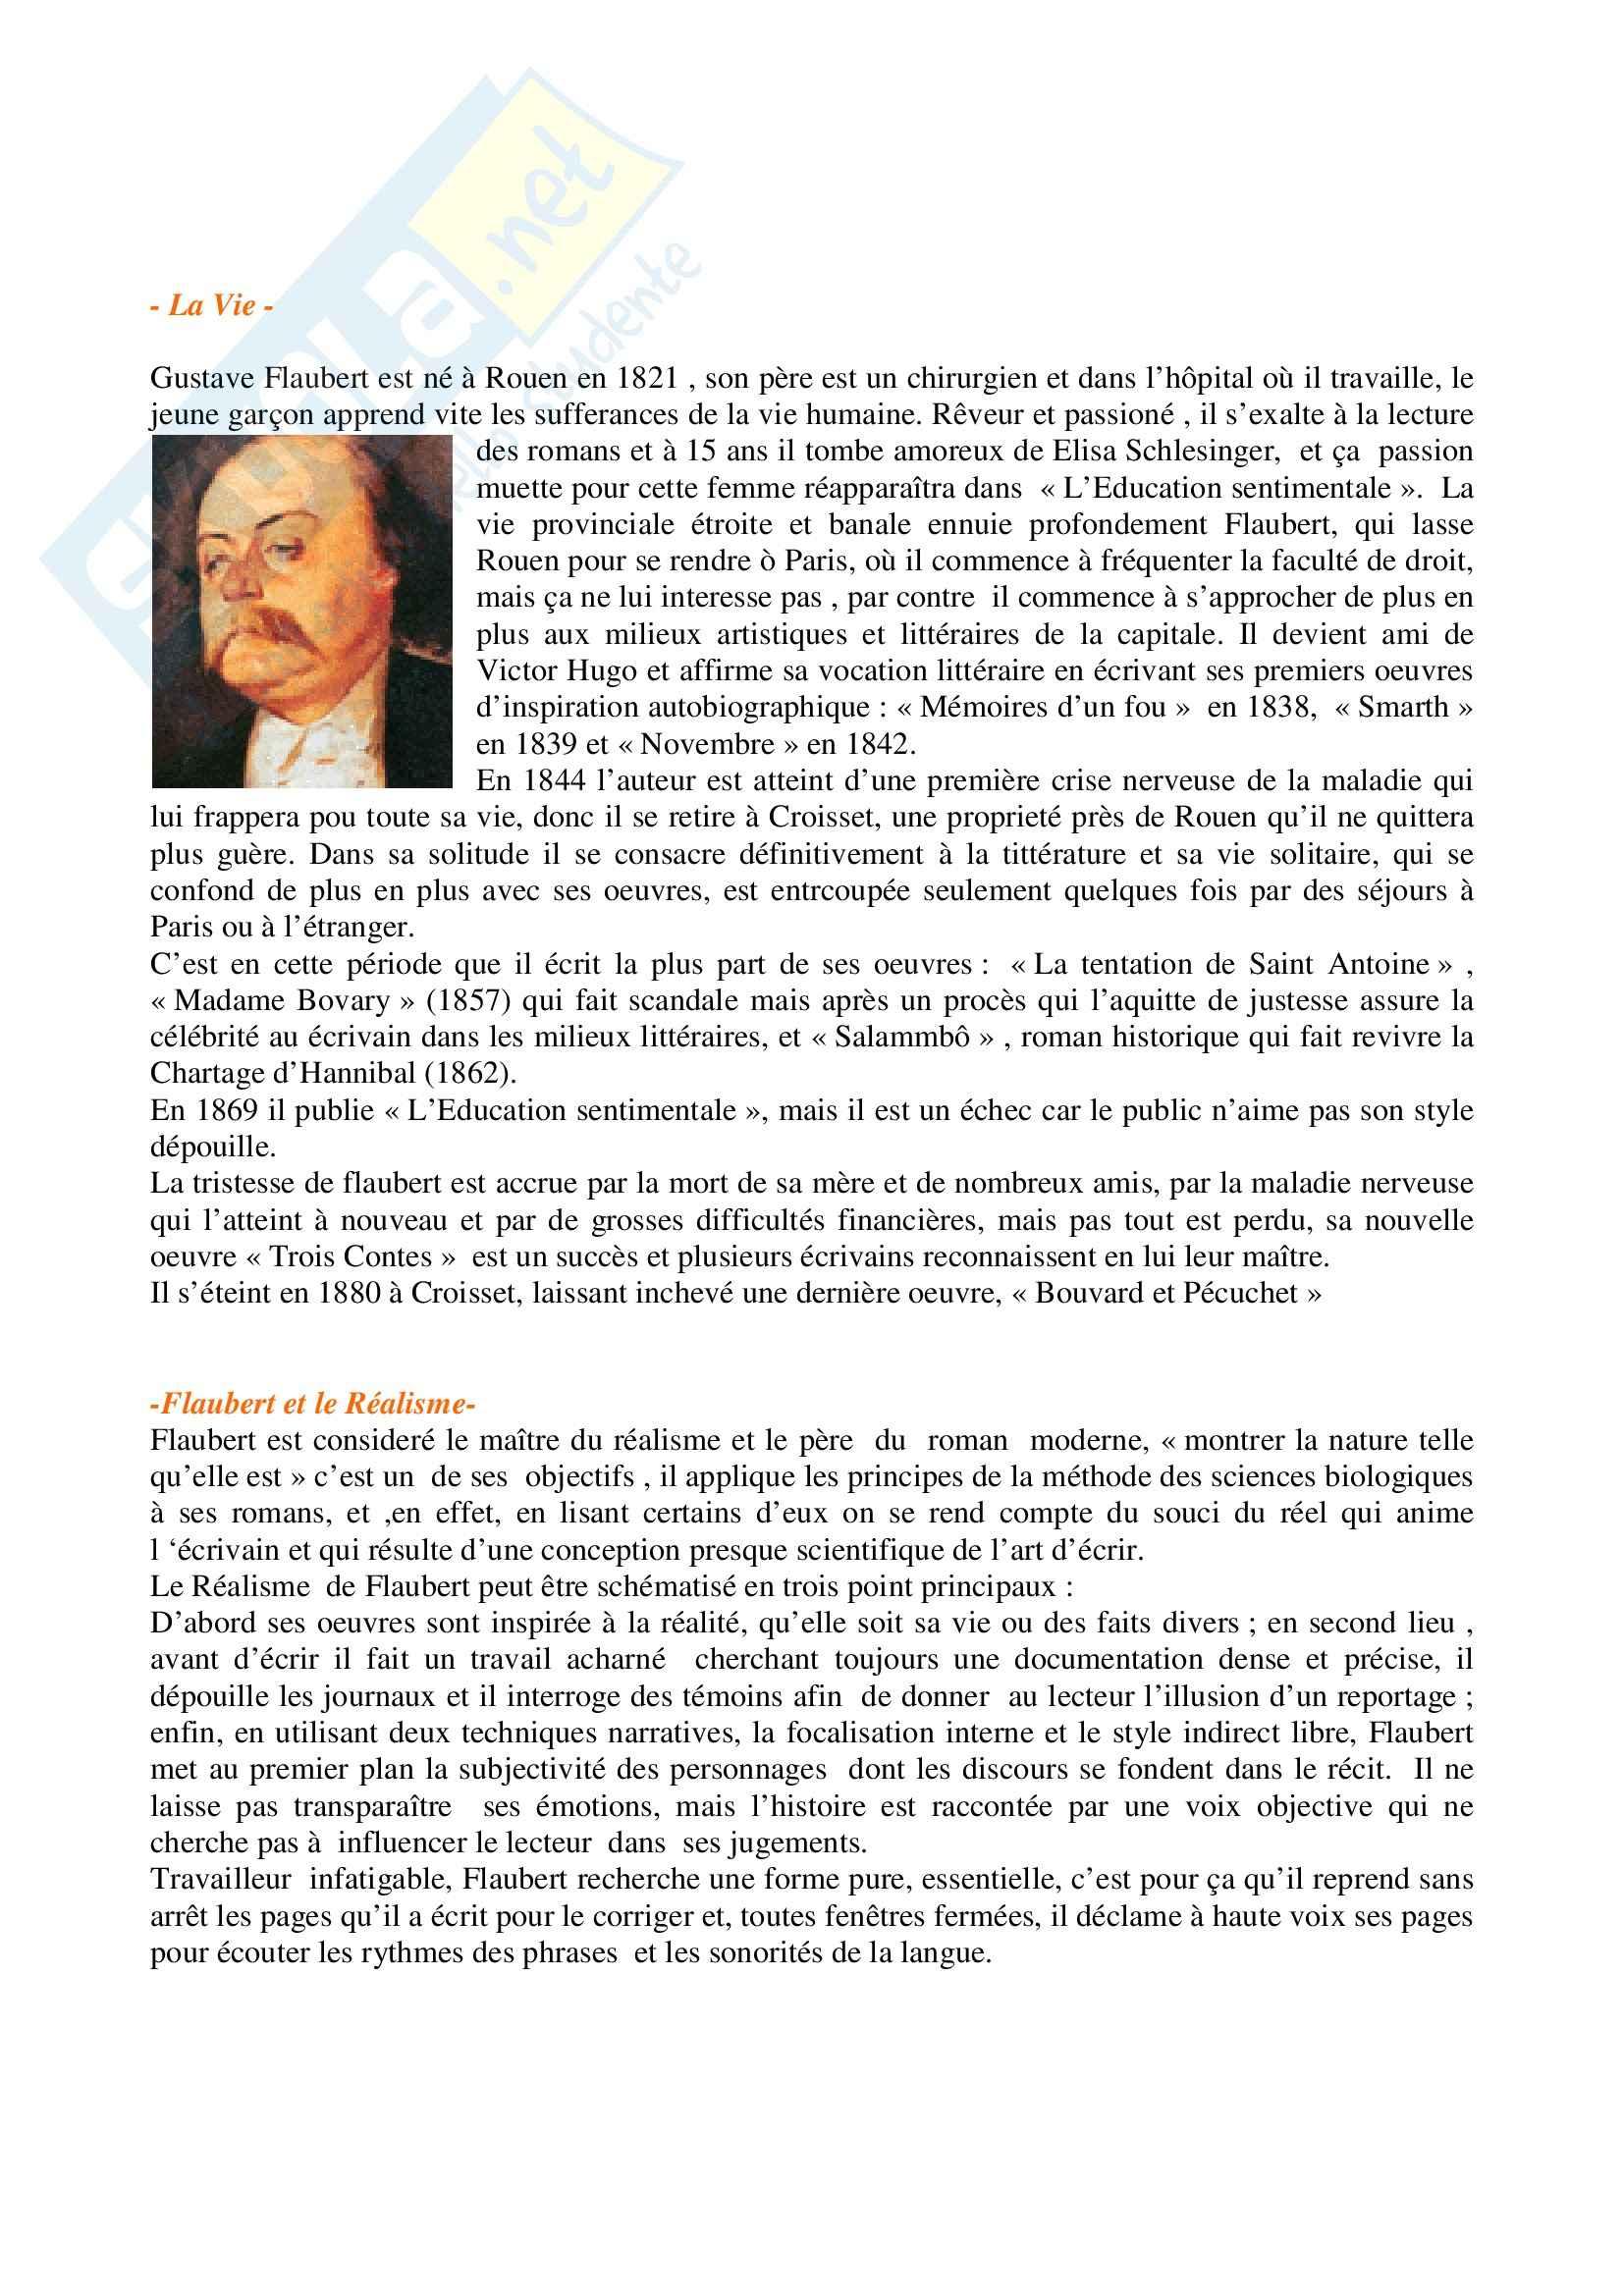 Flauberte et Realisme